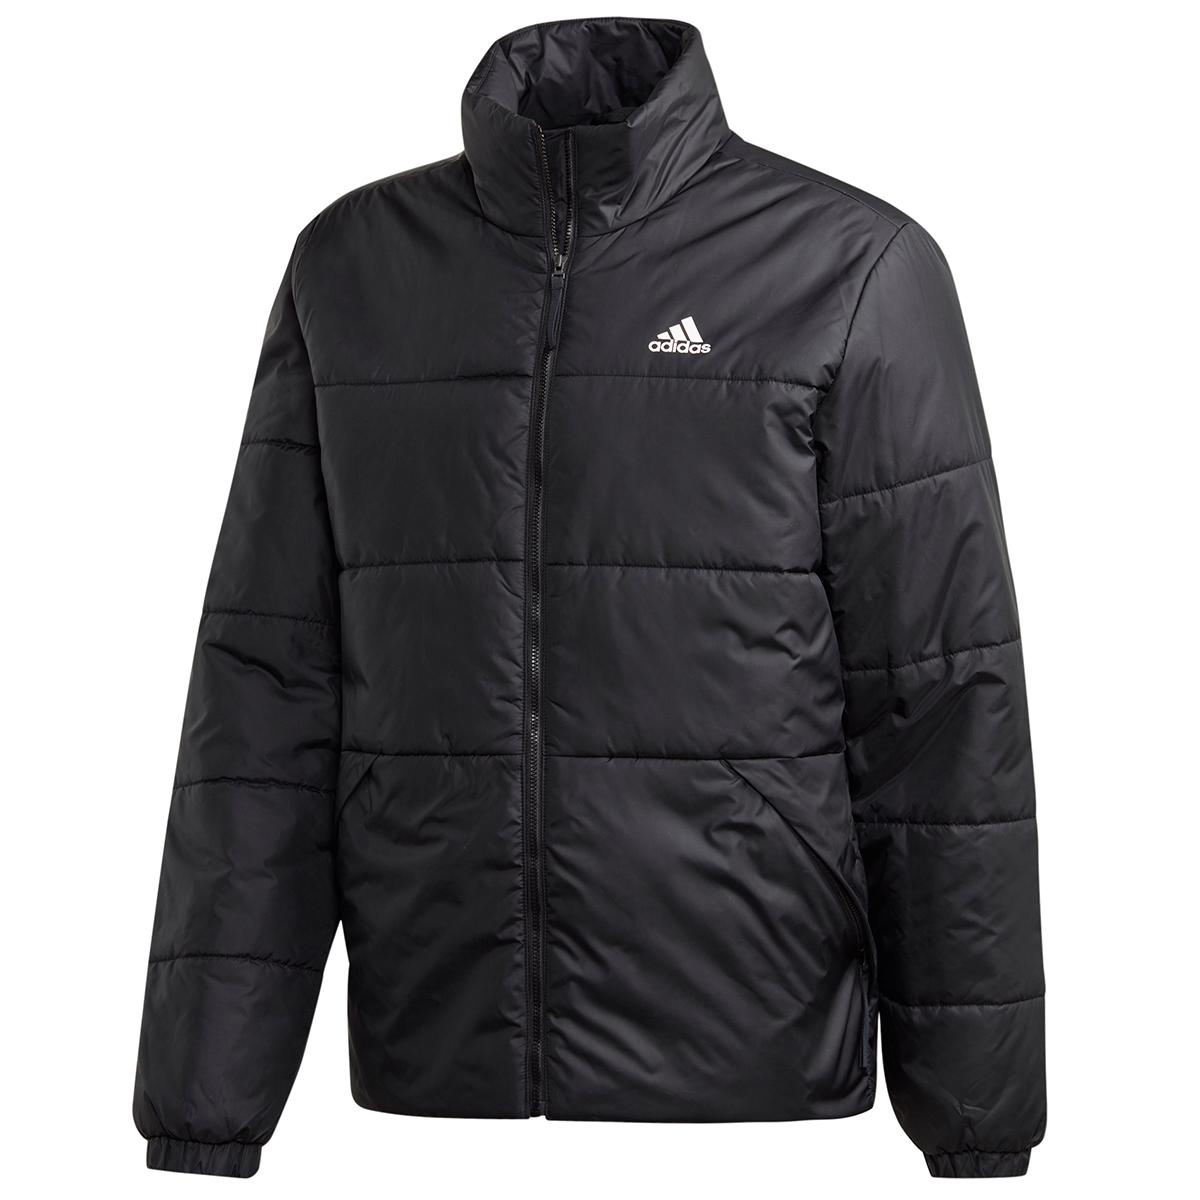 Adidas Men's Bsc 3Stripe Insulated Jacket - Black, XXL